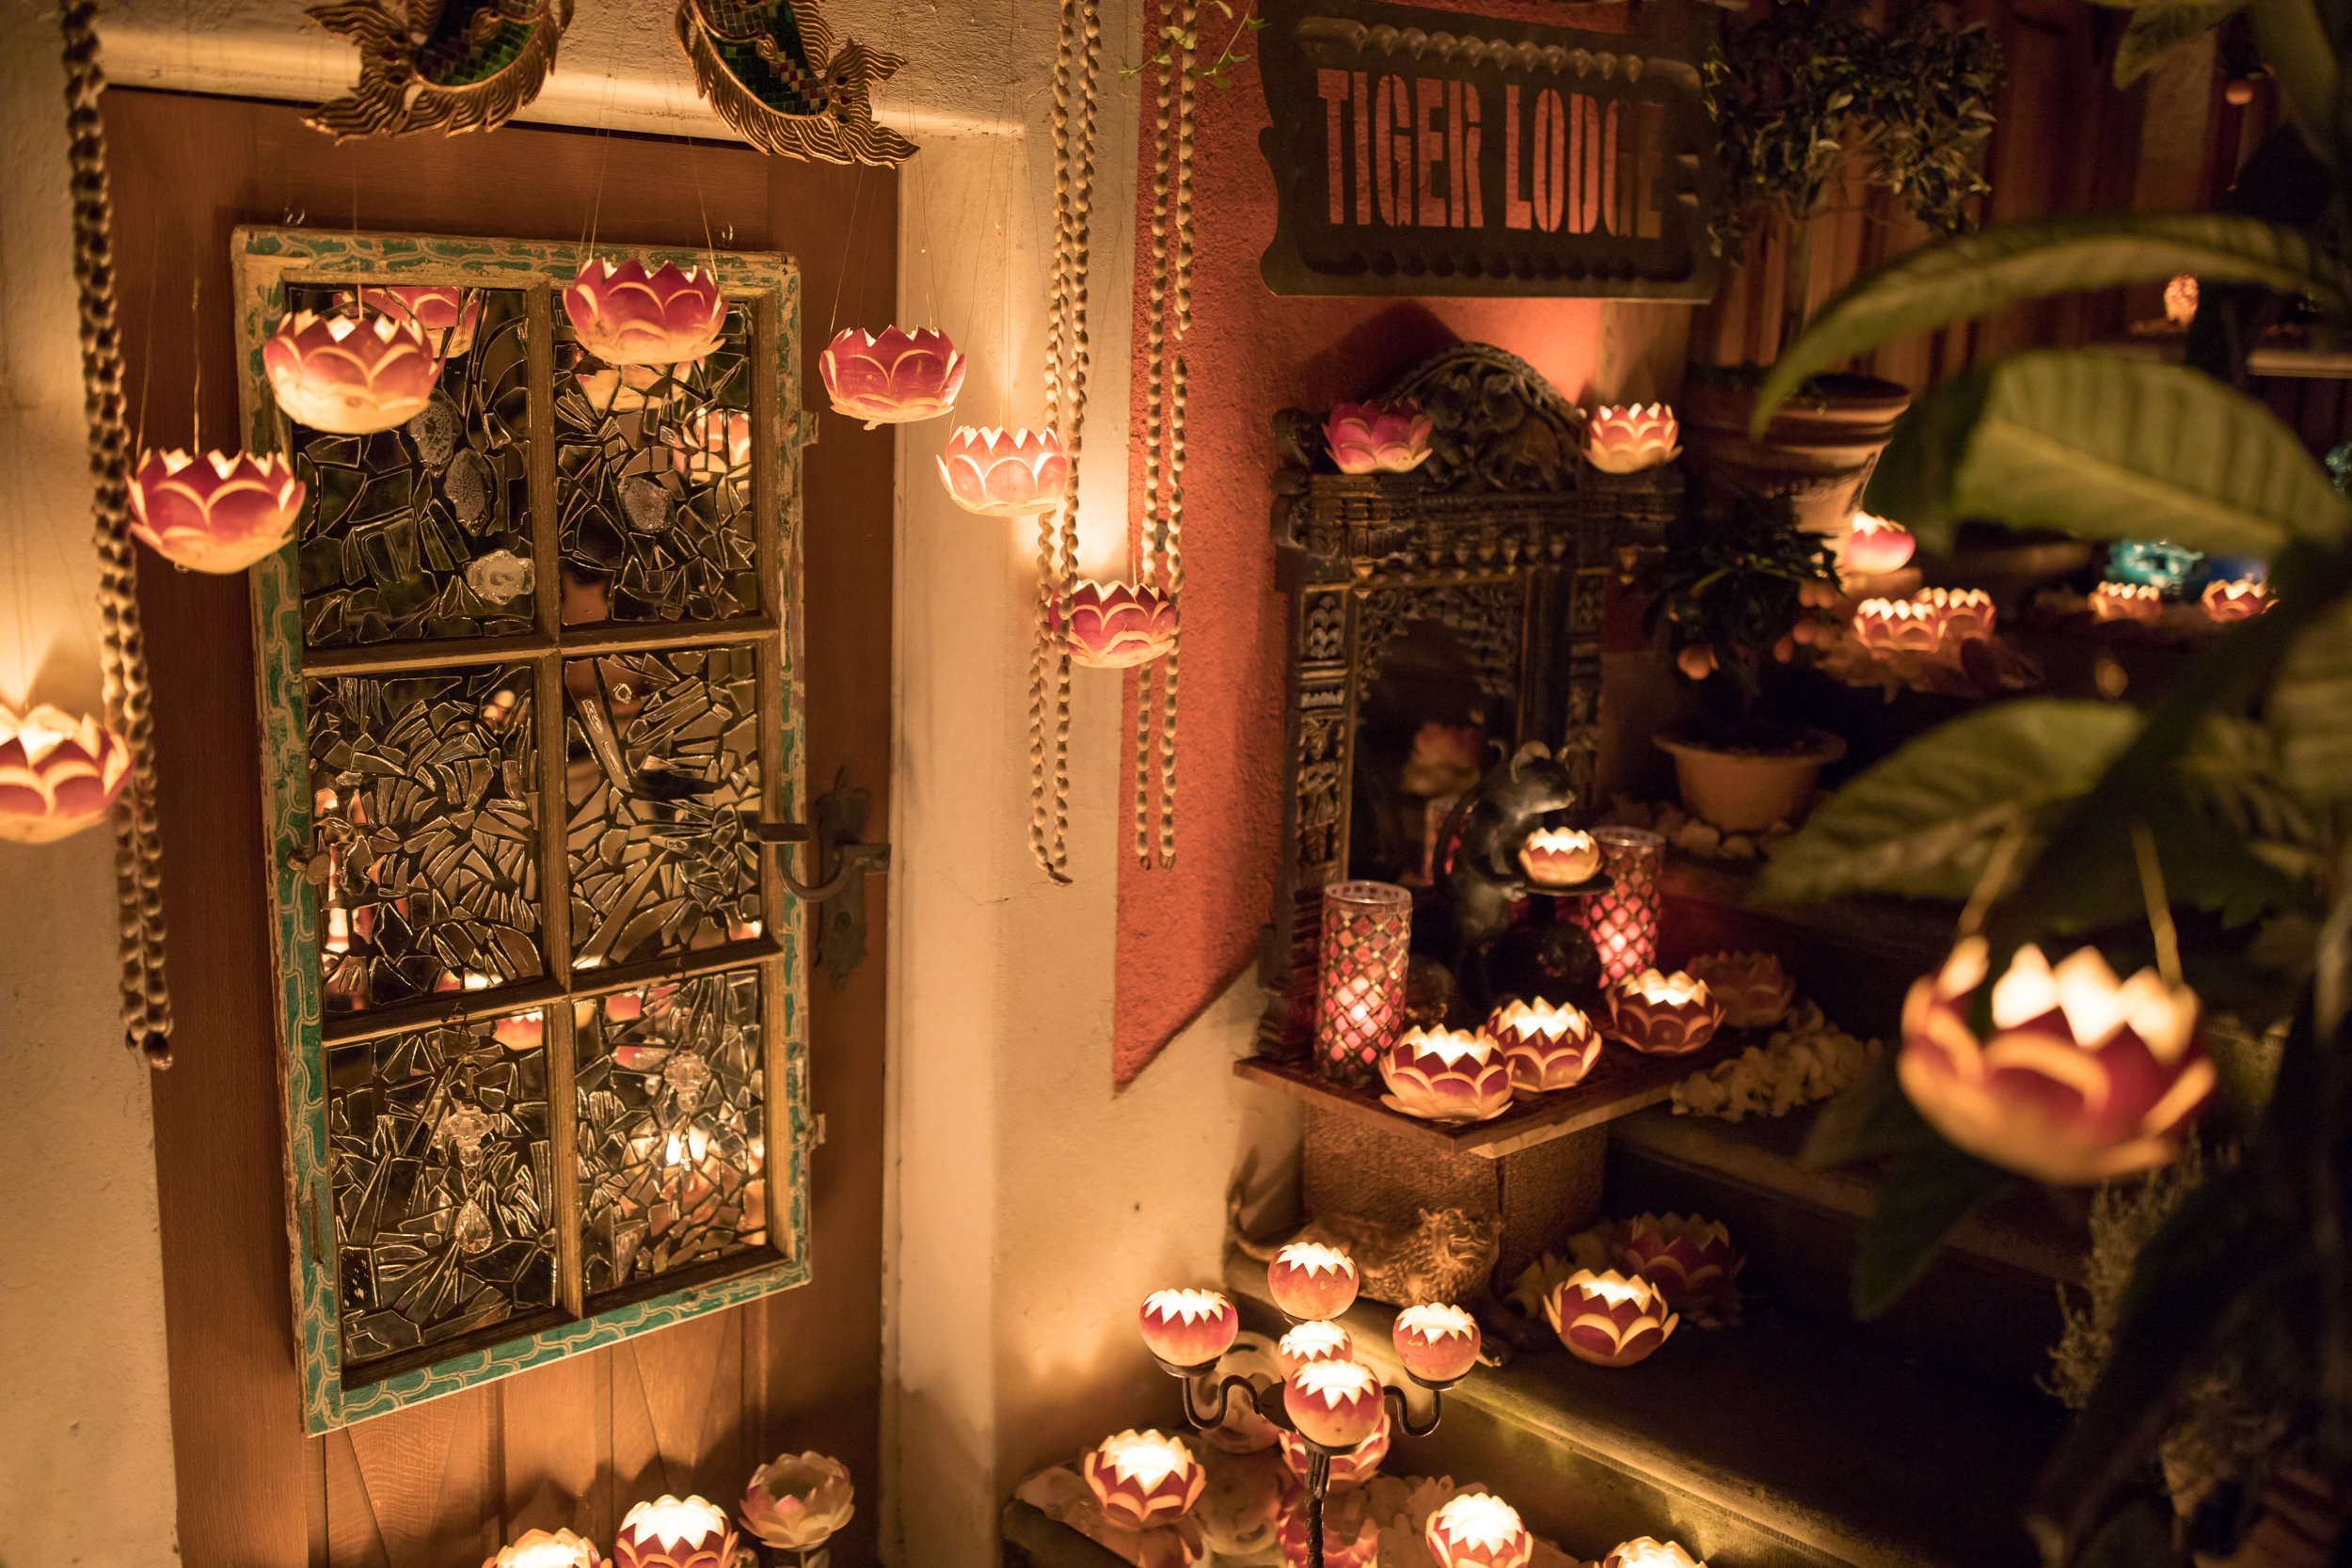 turnip-festival-lotus-flowers-richterswil-switzerland--something-swiss.jpg.jpg.jpg